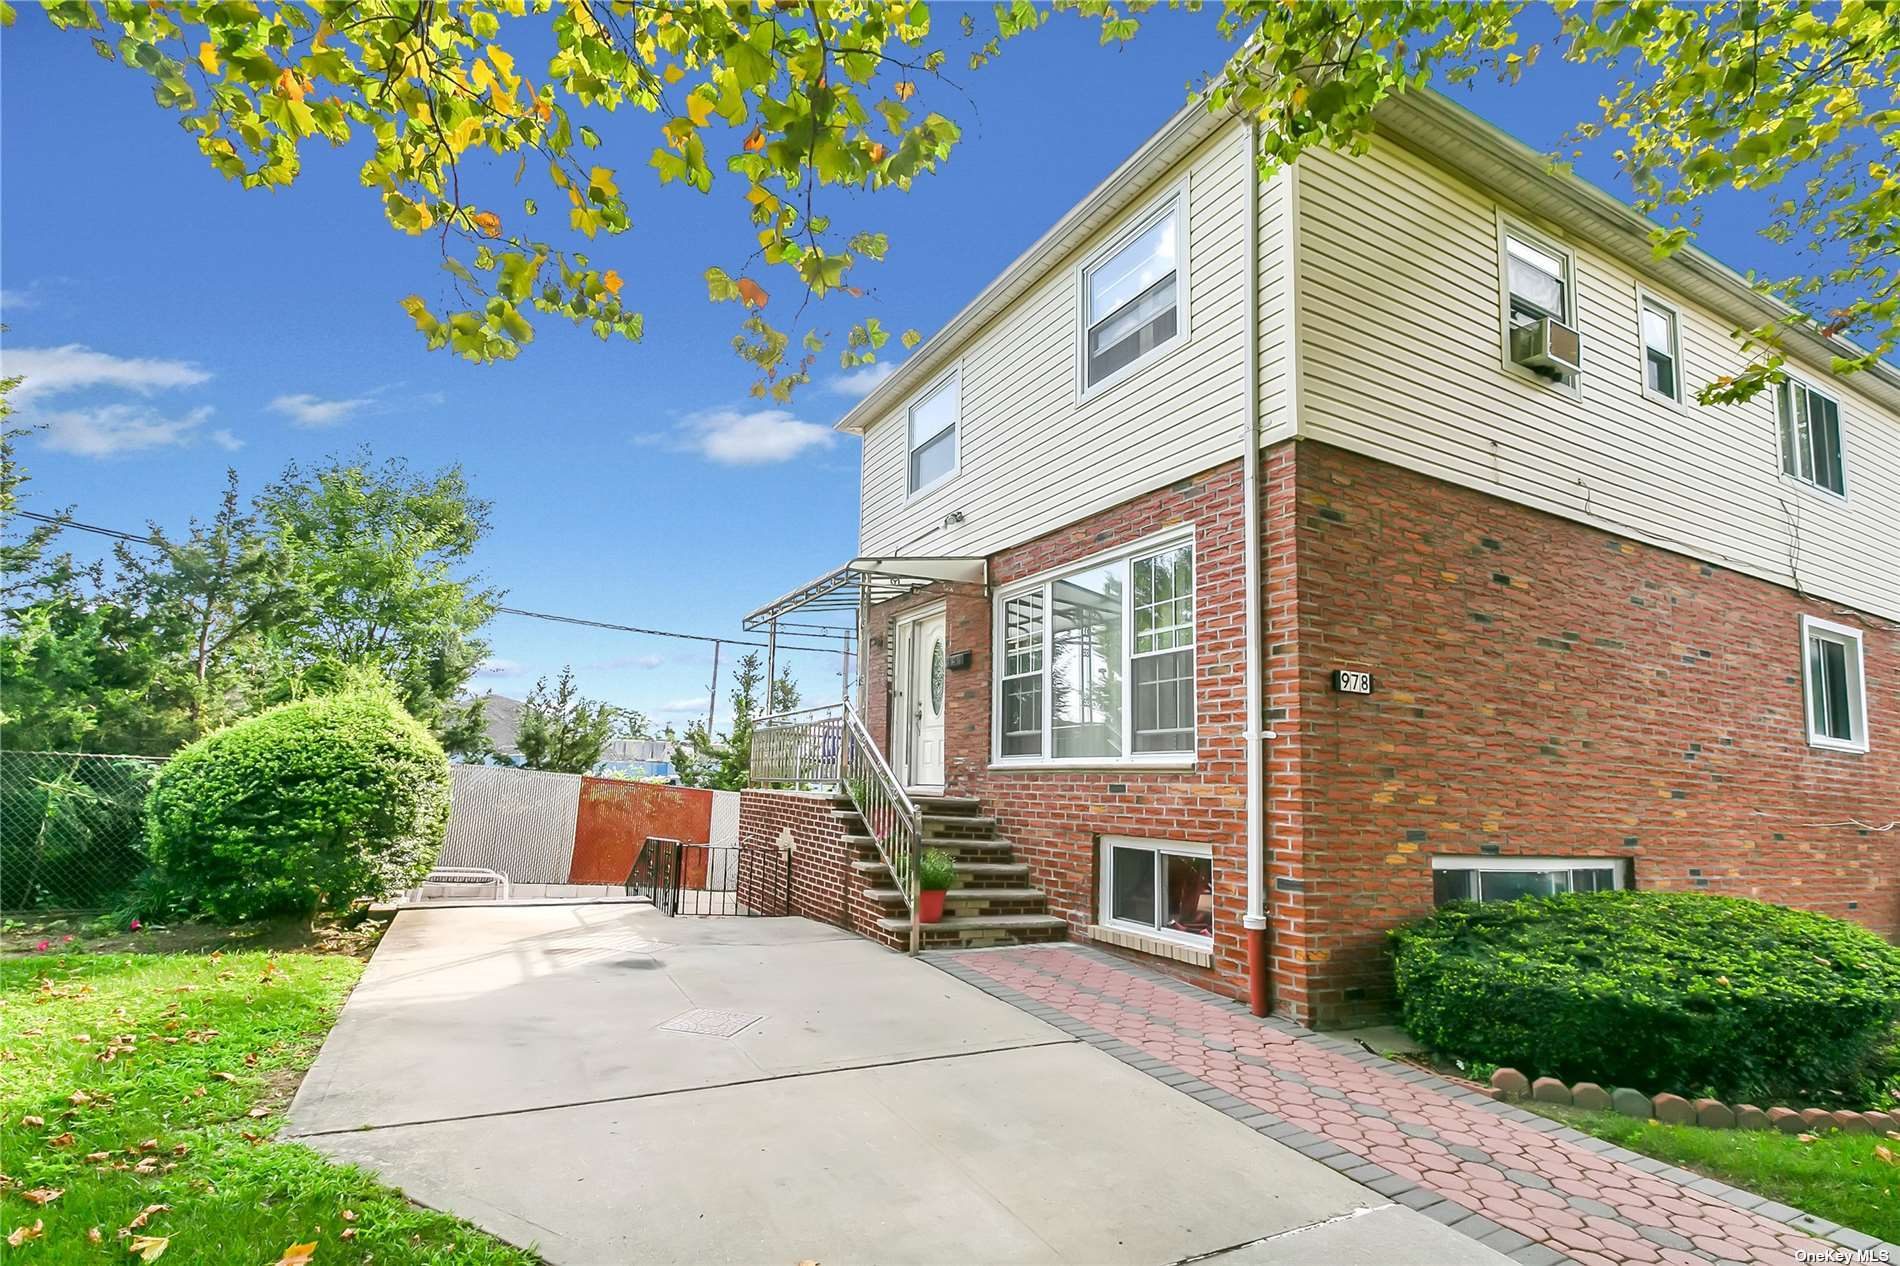 978 E.77 Street, Canarsie, New York11236   Residential For Sale